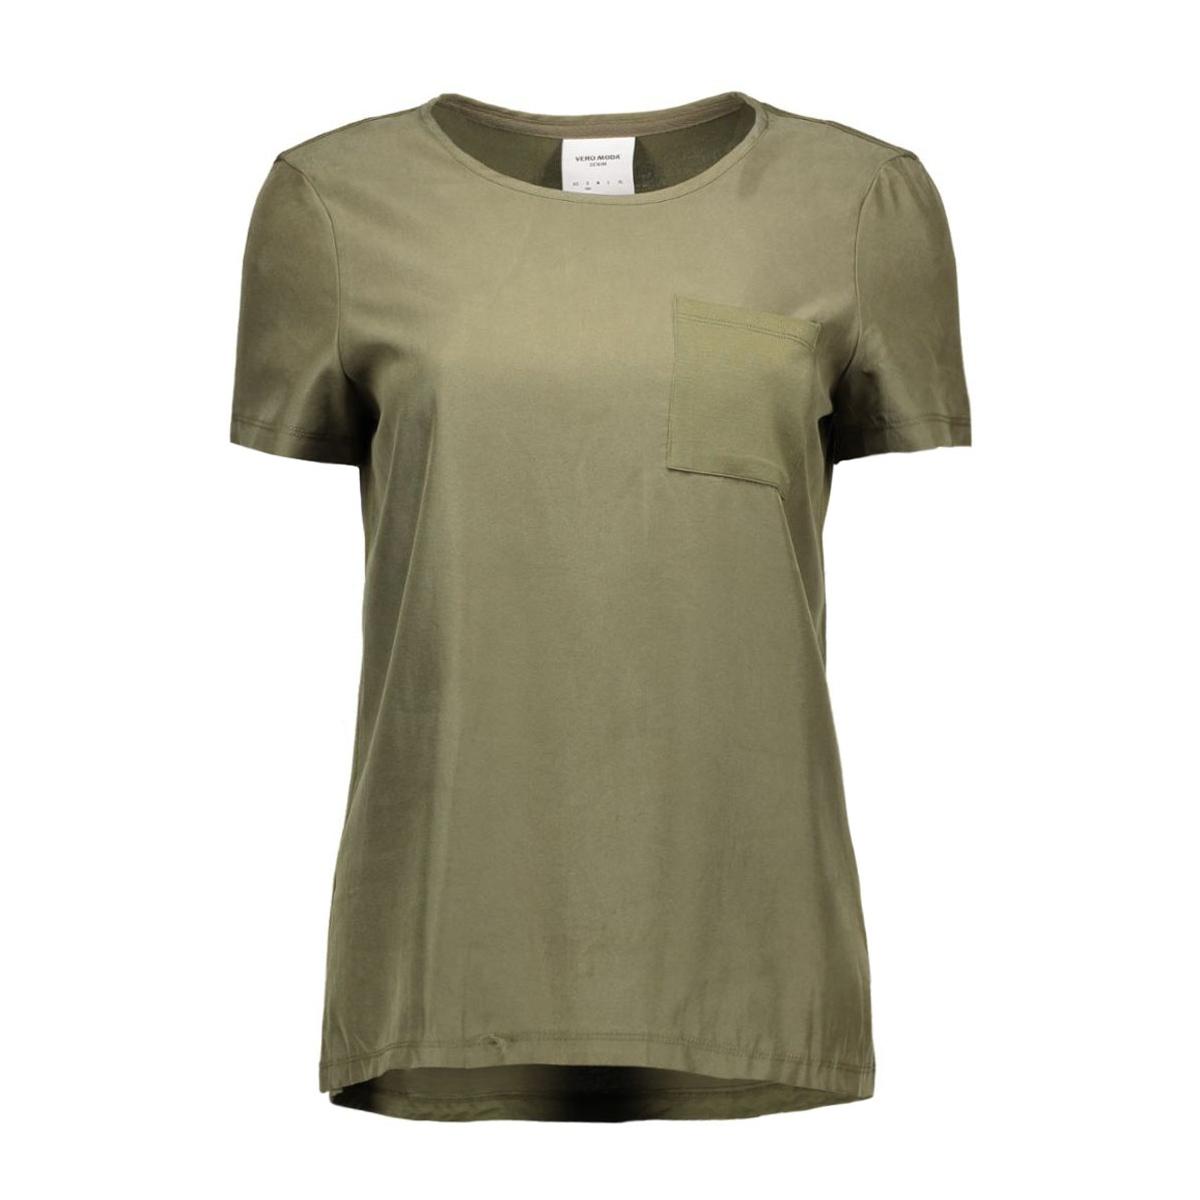 vmtenna s/s top dnm ga 10161808 vero moda t-shirt ivy green